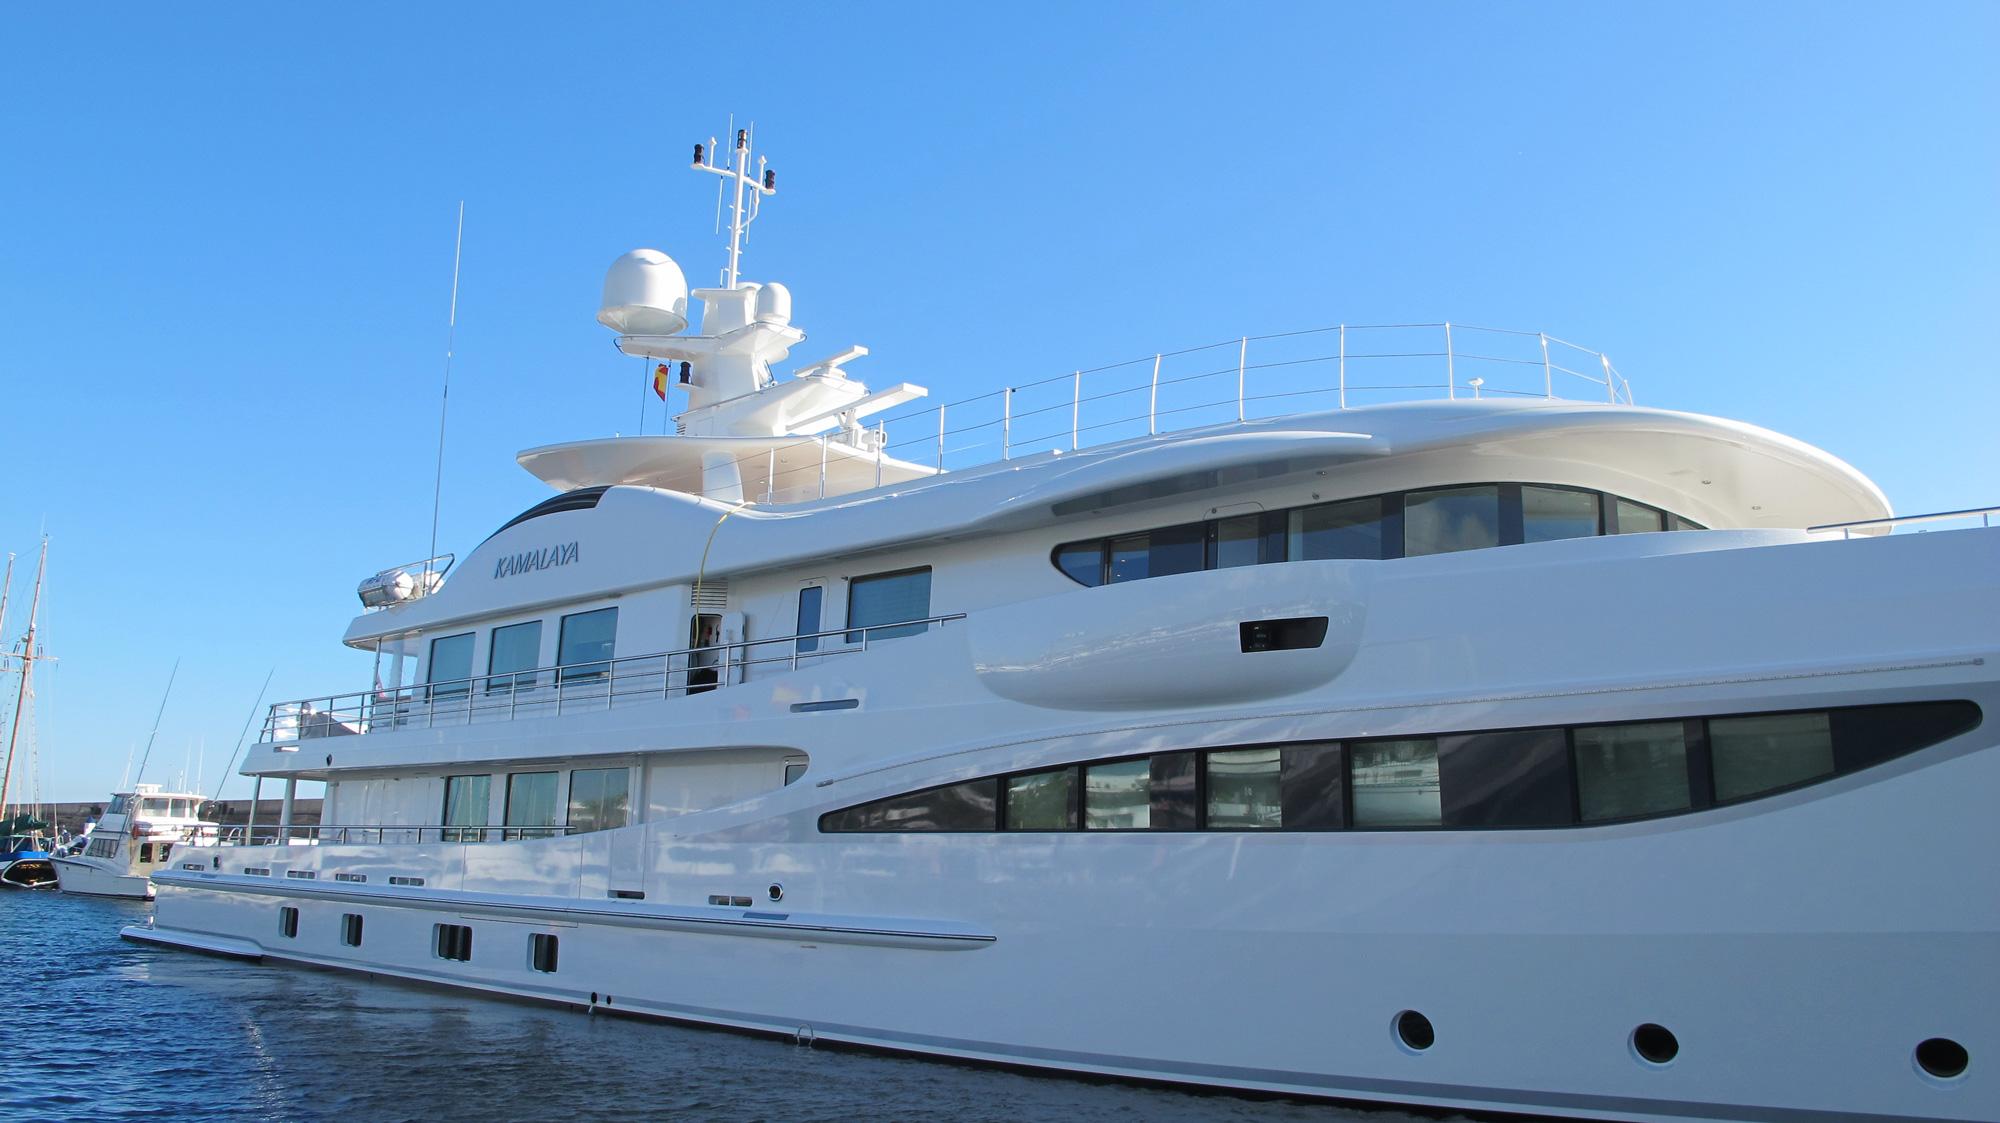 Kamalaya superyacht docked at a marina in Lanzarote.